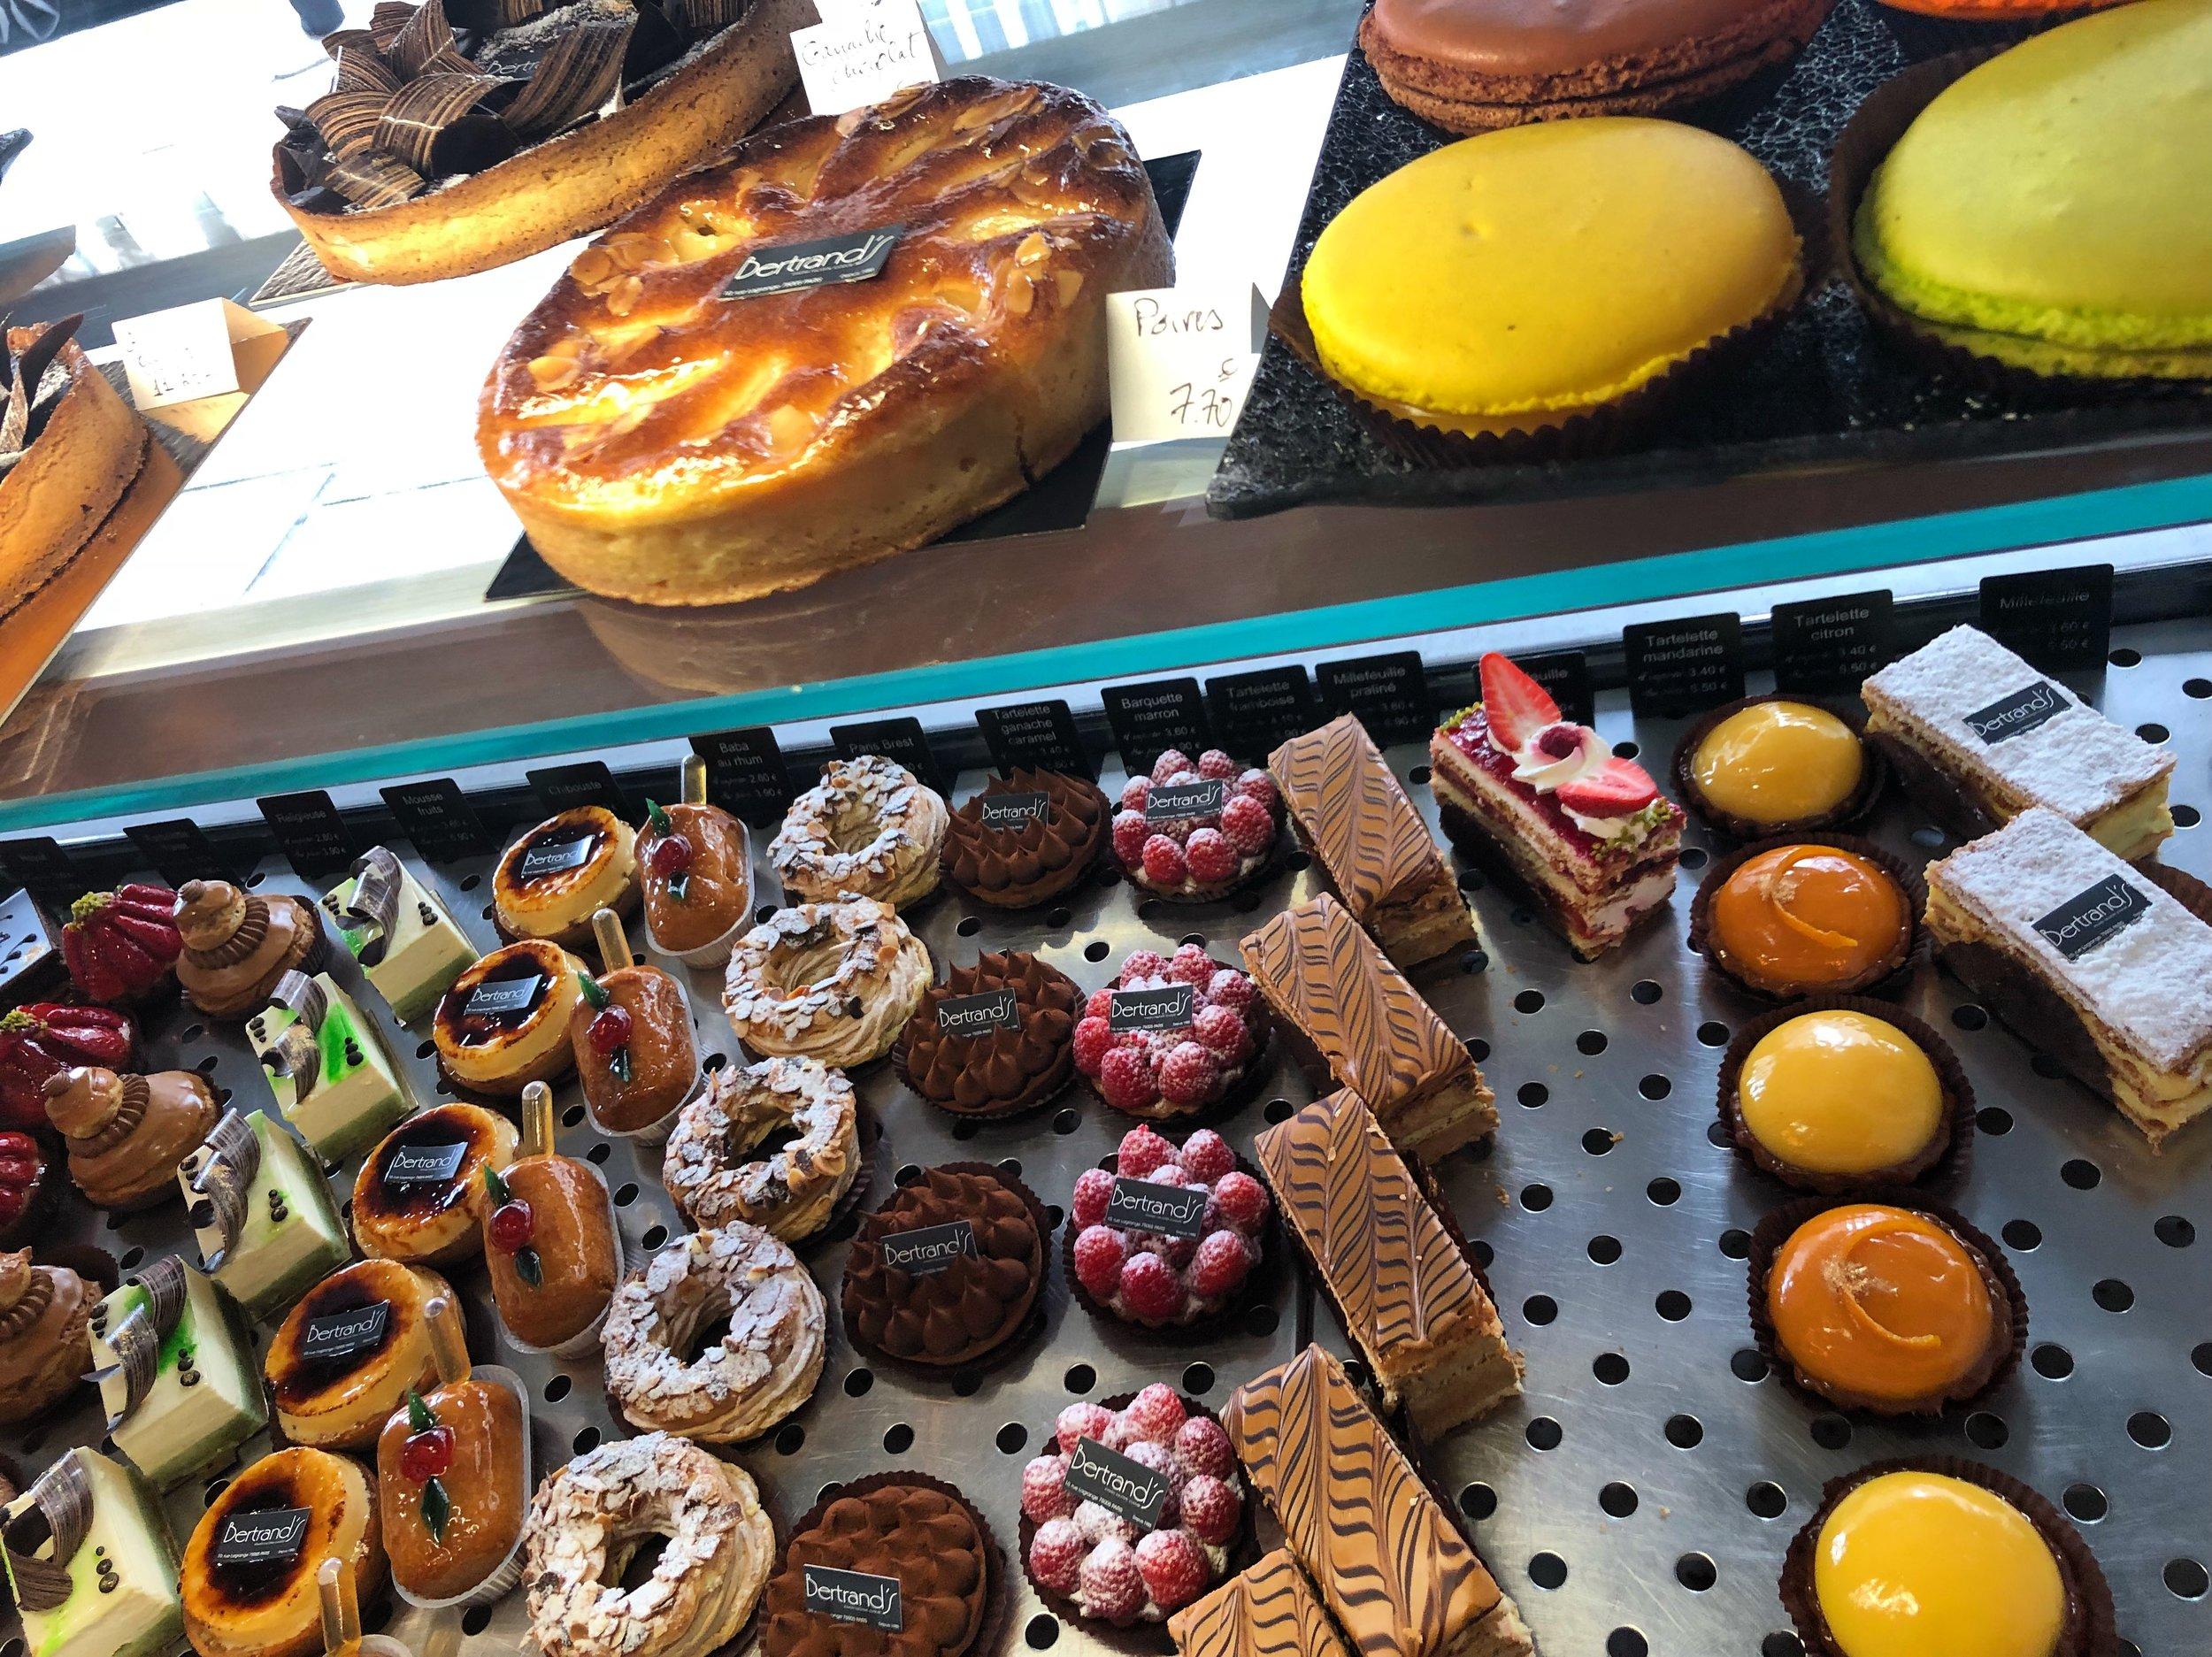 Obligatory pastries